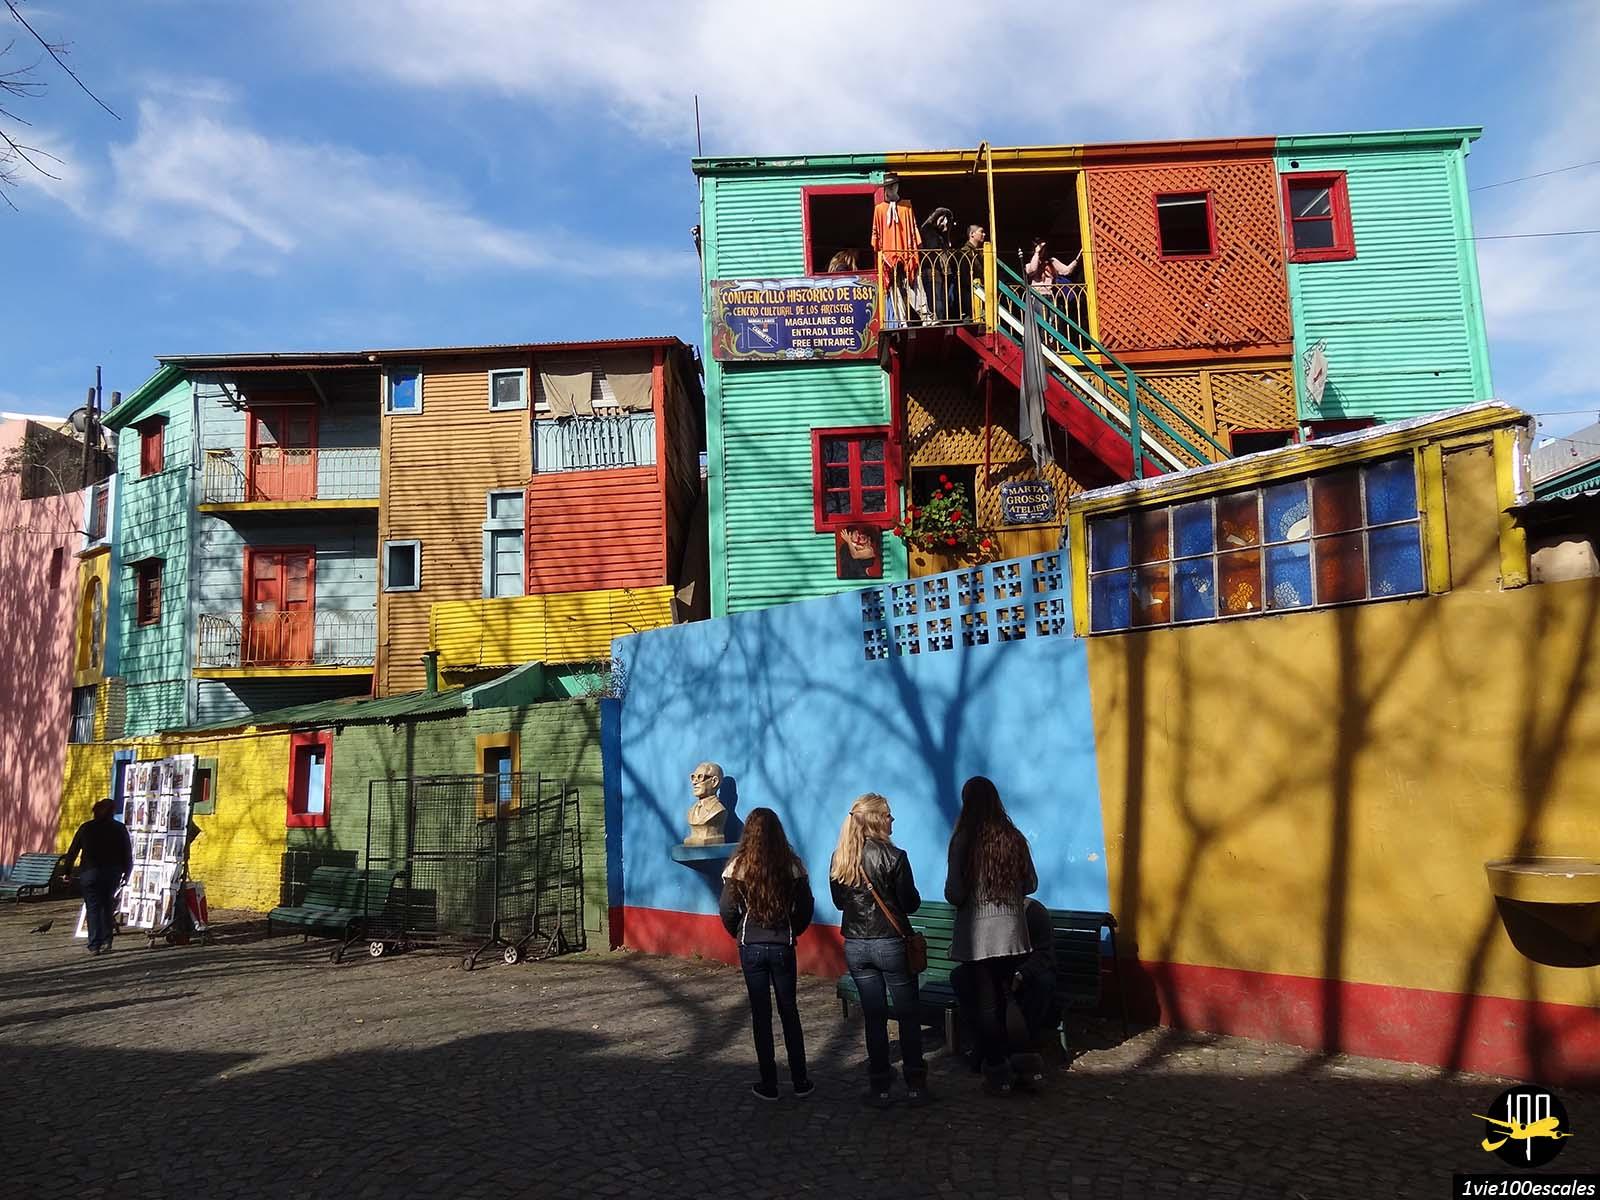 Escale #045 Buenos Aires